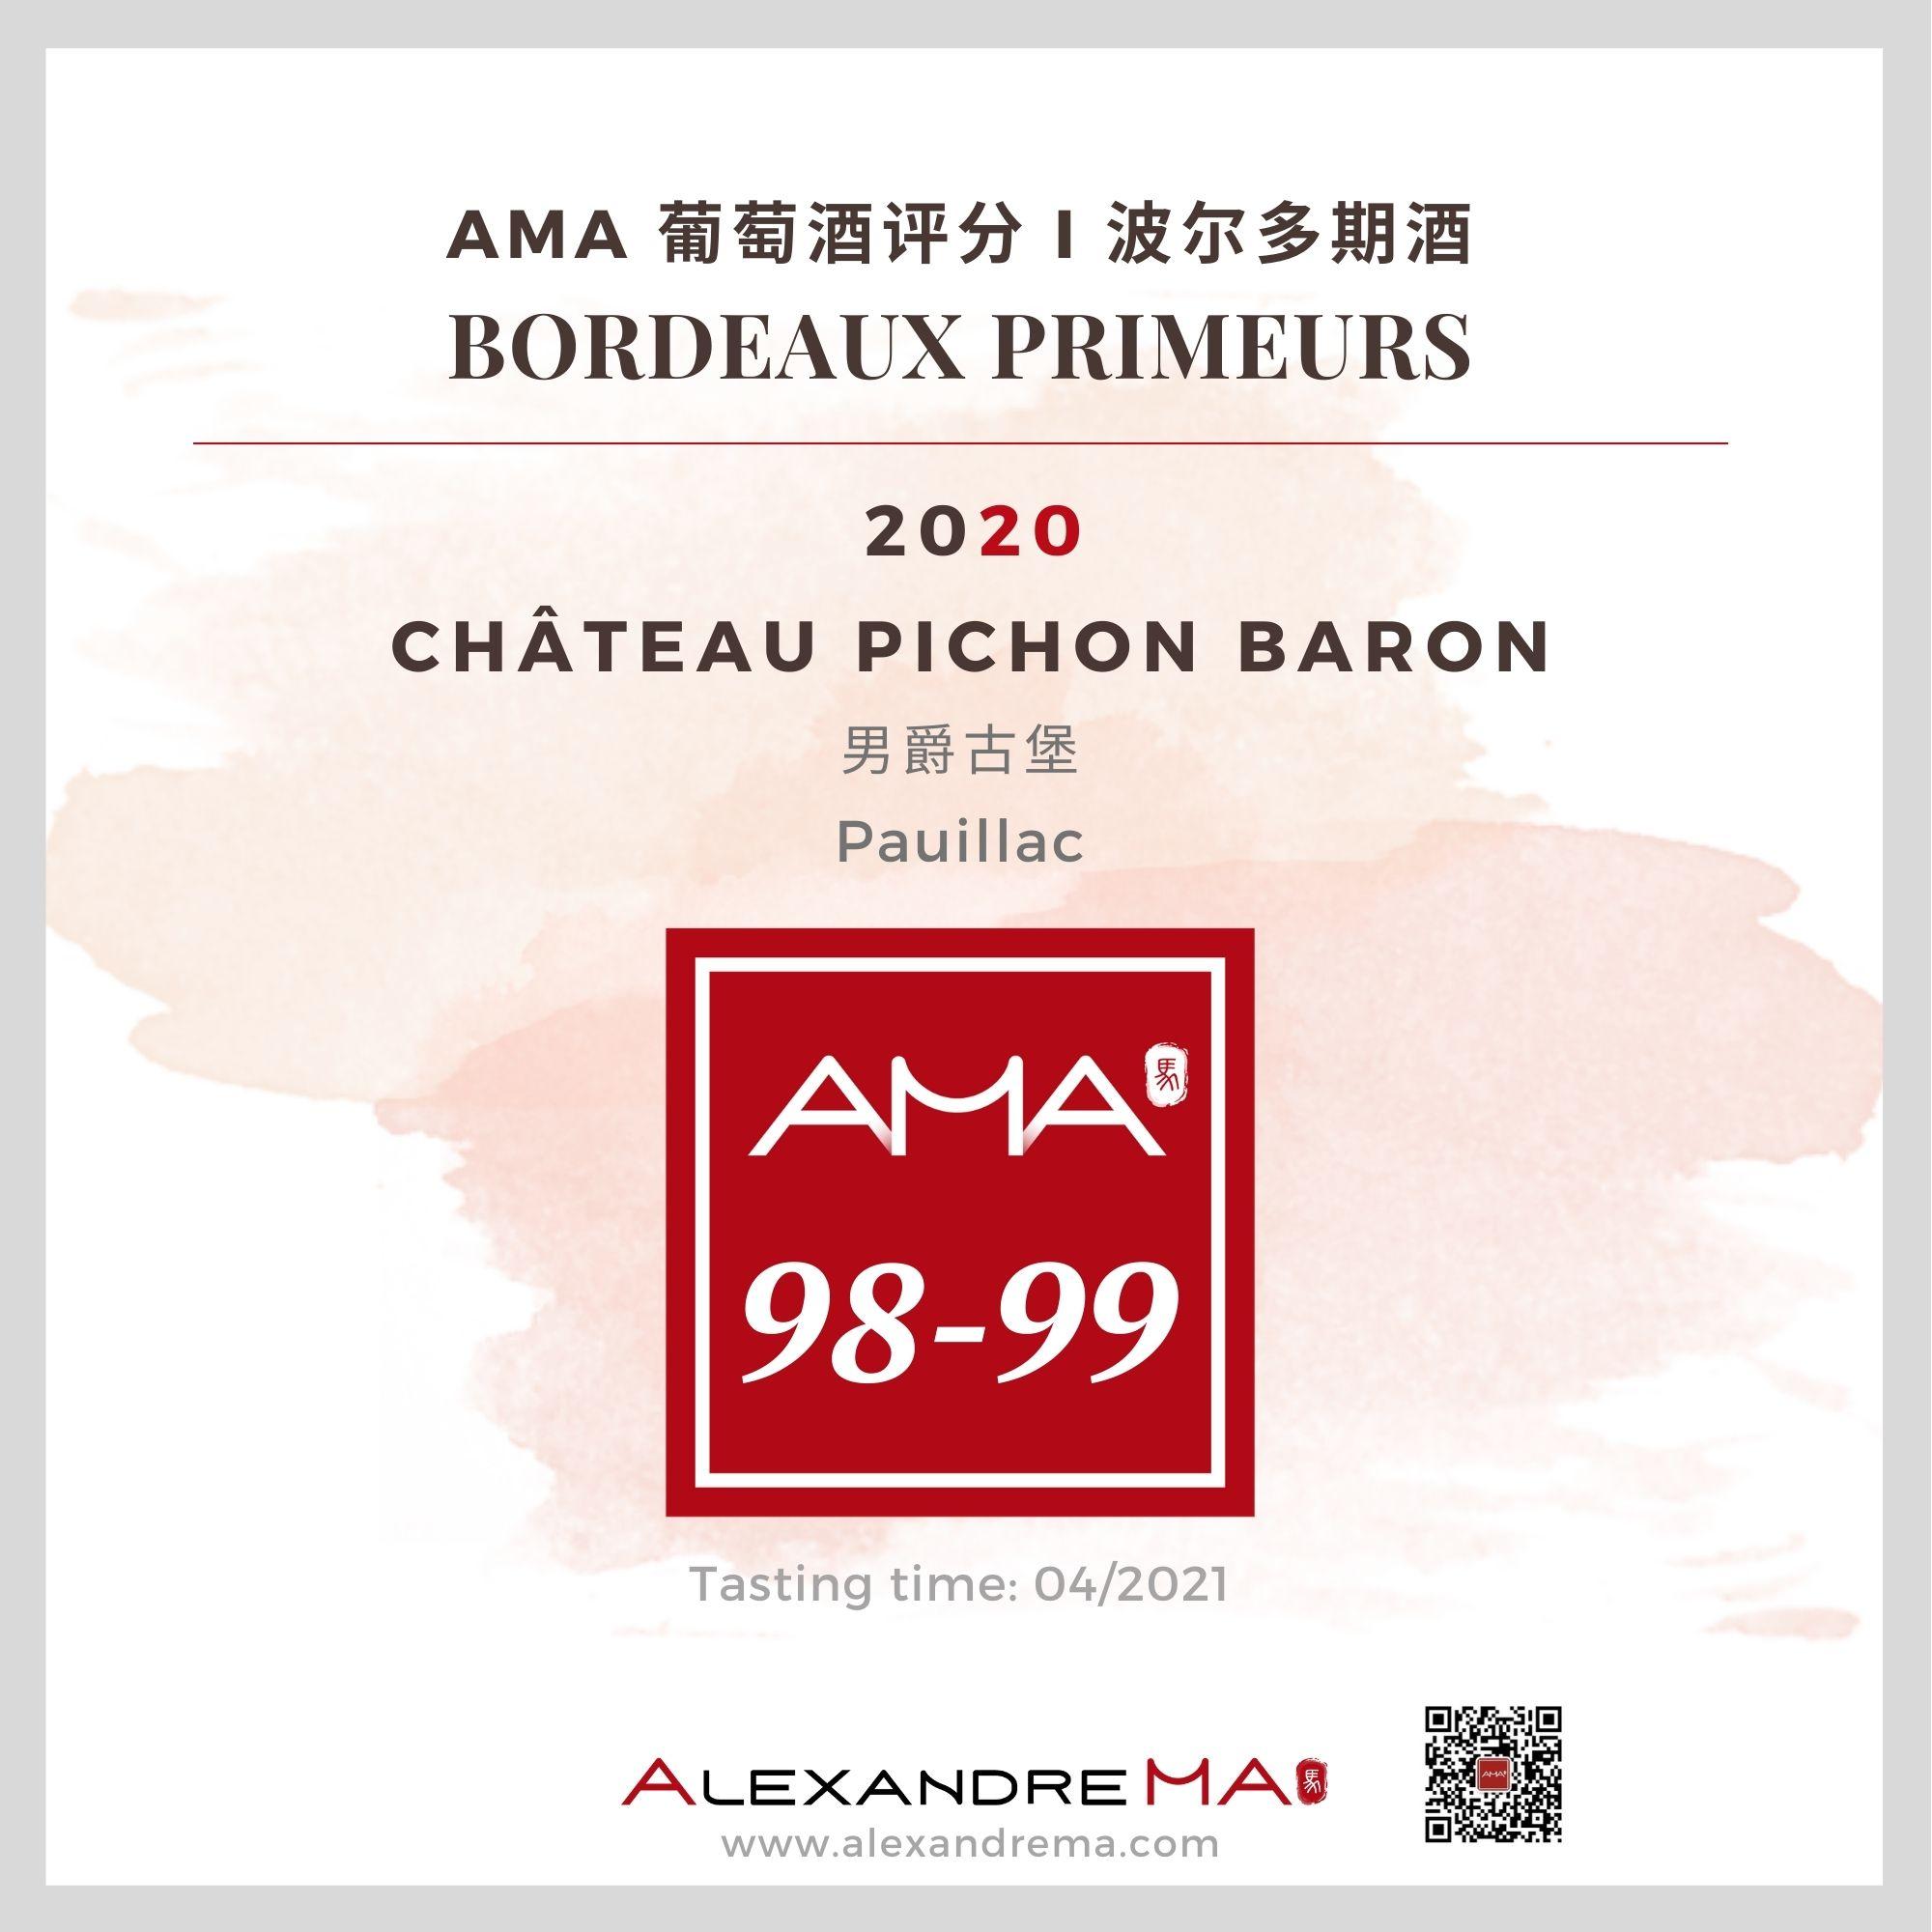 Château Pichon Baron 2020 男爵古堡 - Alexandre Ma